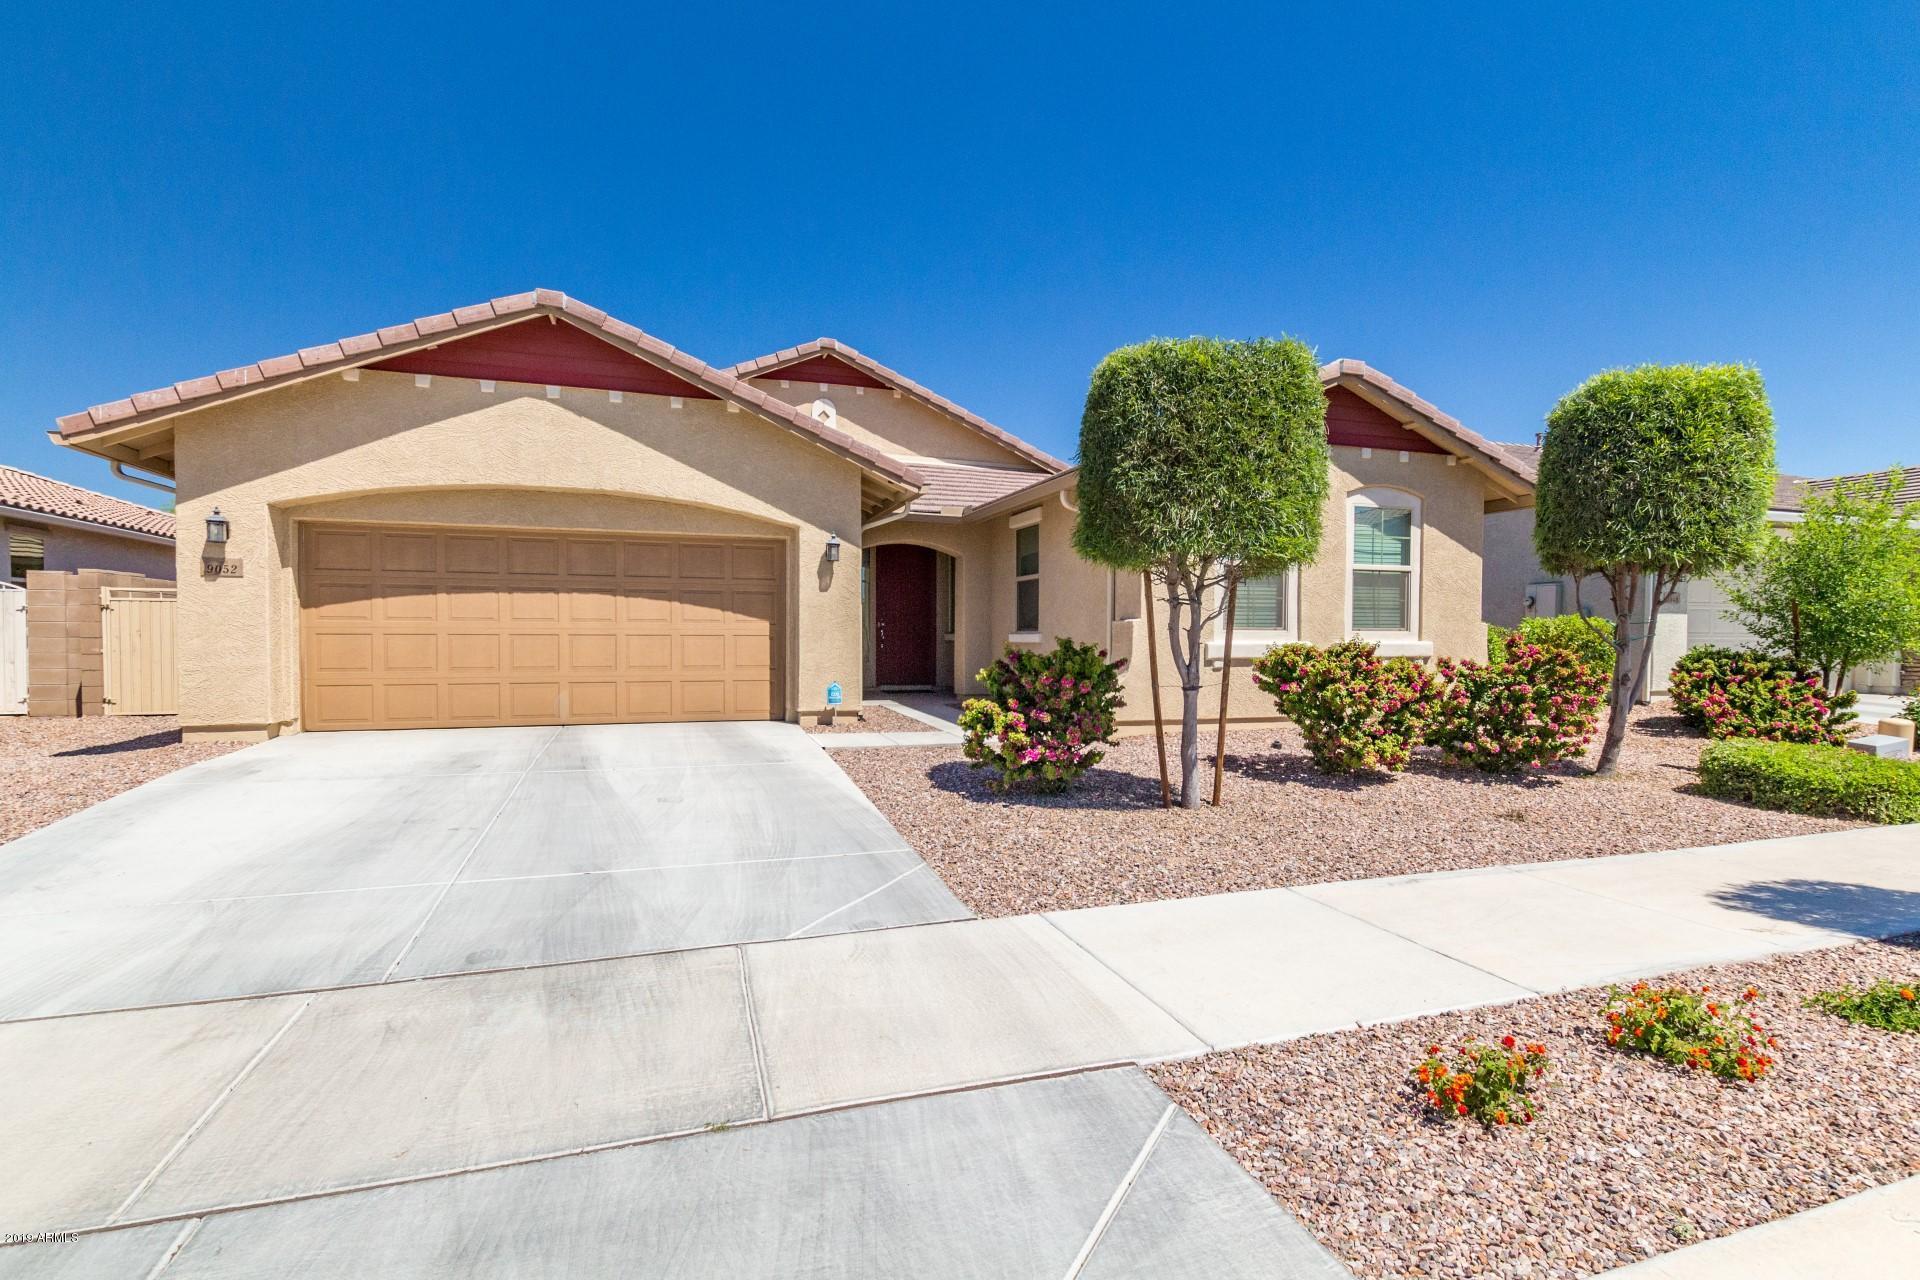 9052 W ALICE Avenue, Peoria, Arizona